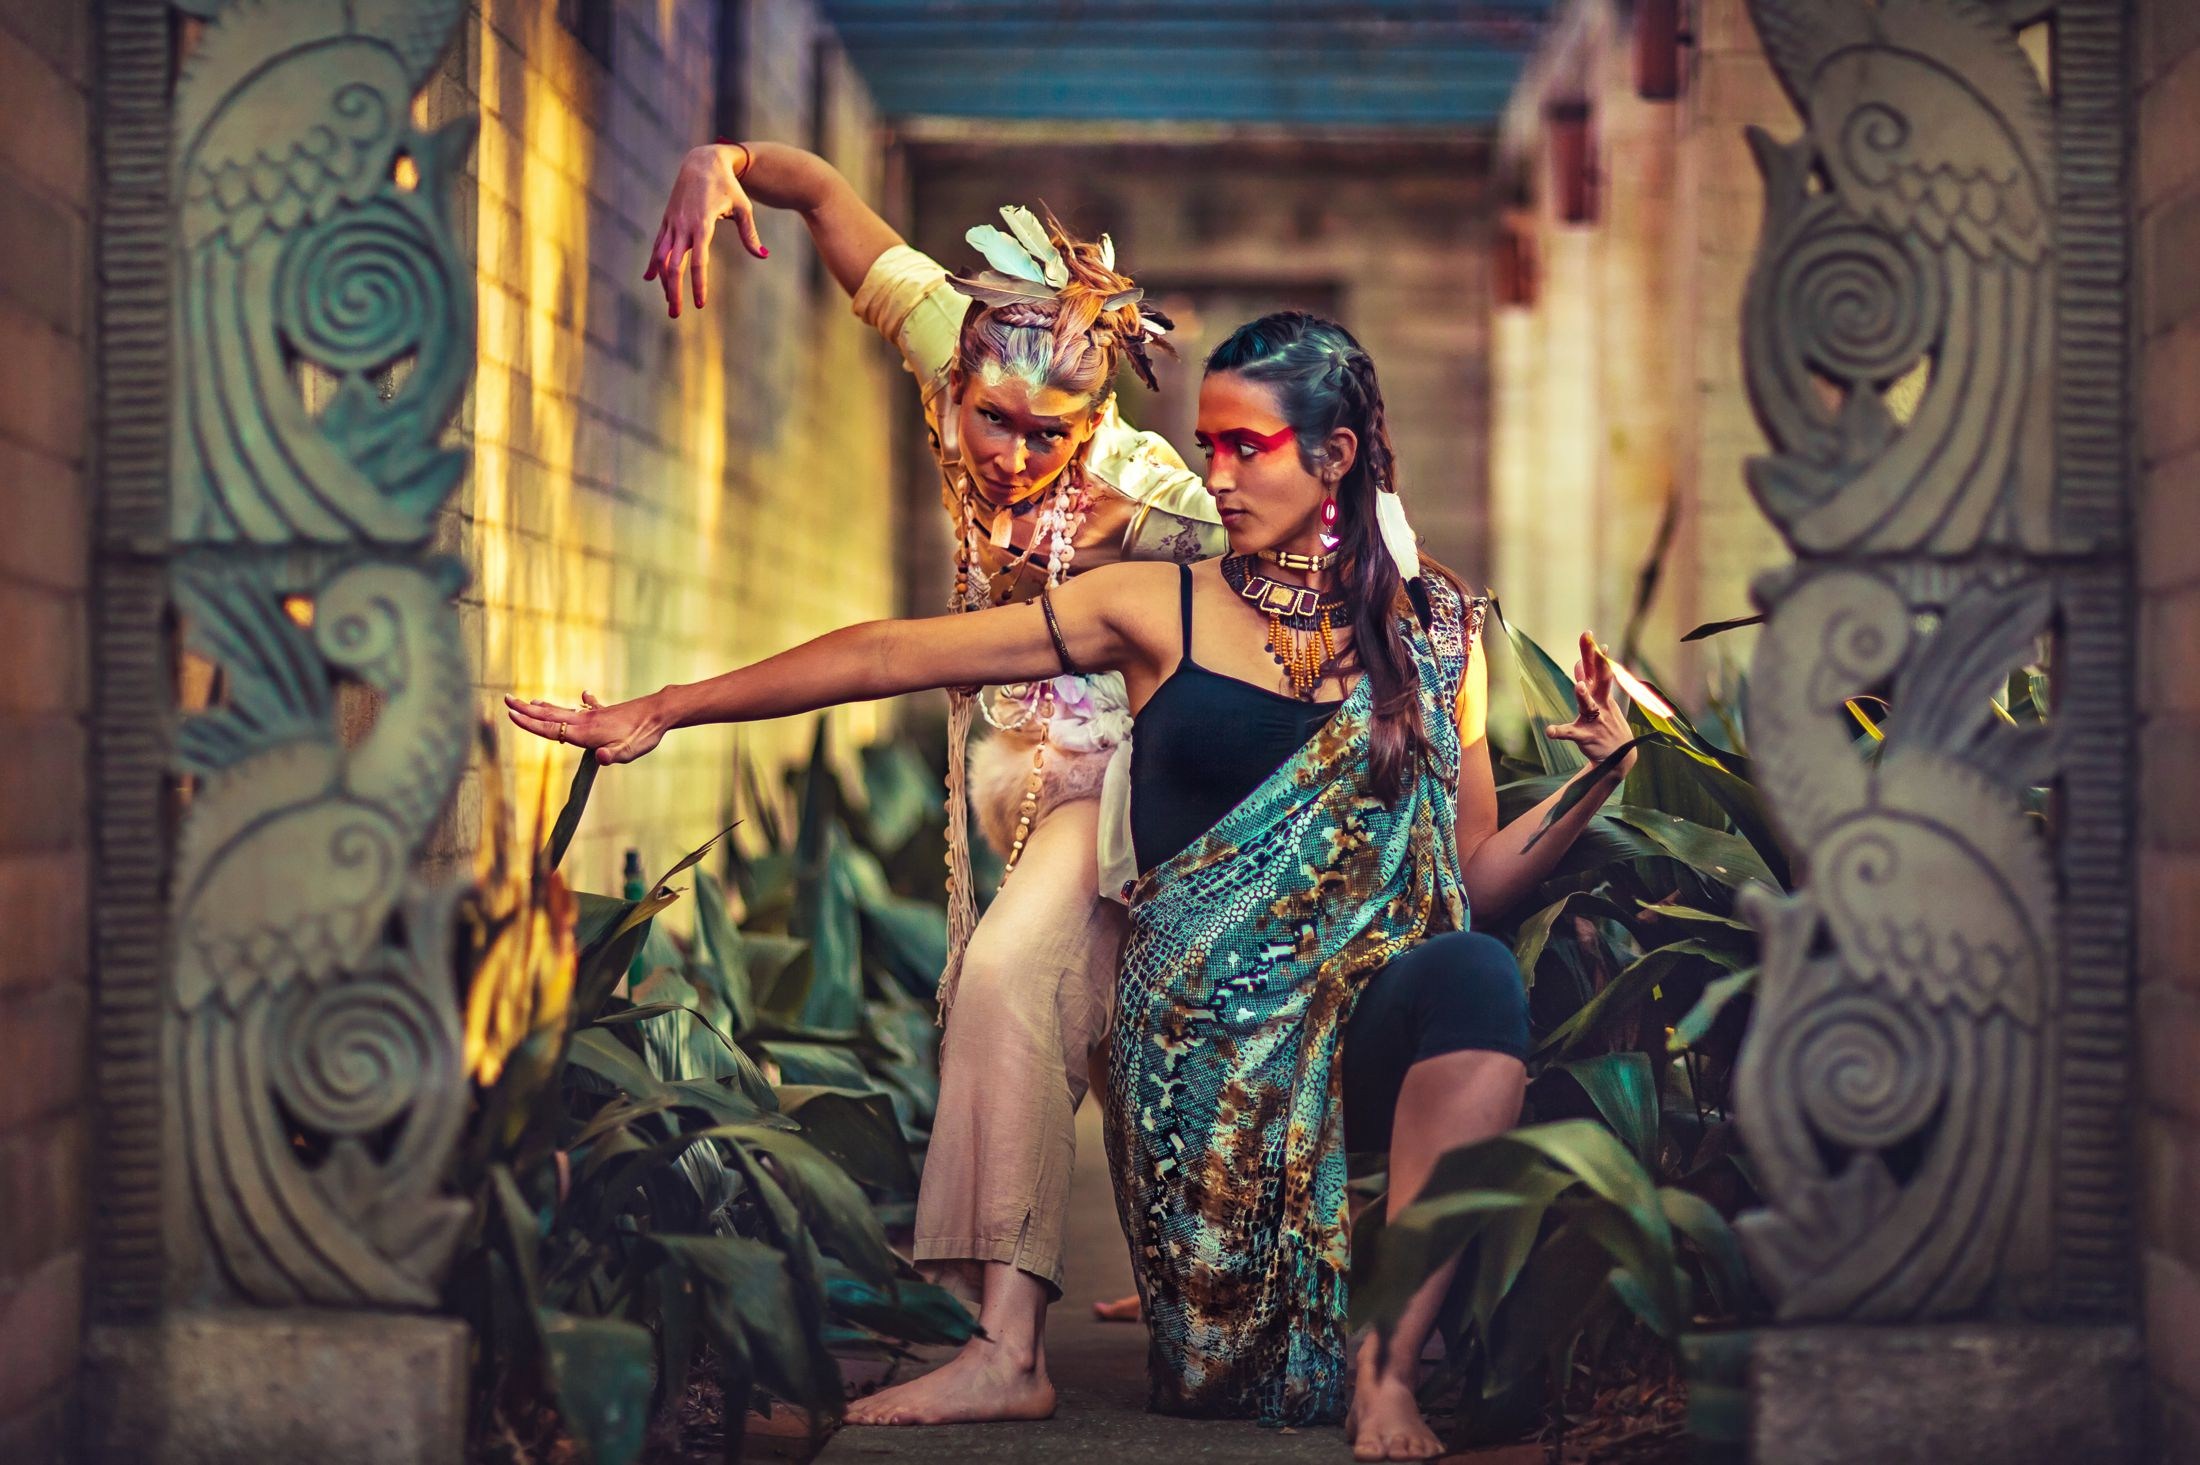 Electric Forest yoga LED light nomad festival style ethnic global fashion shoot warpaint tribal 4.jpg